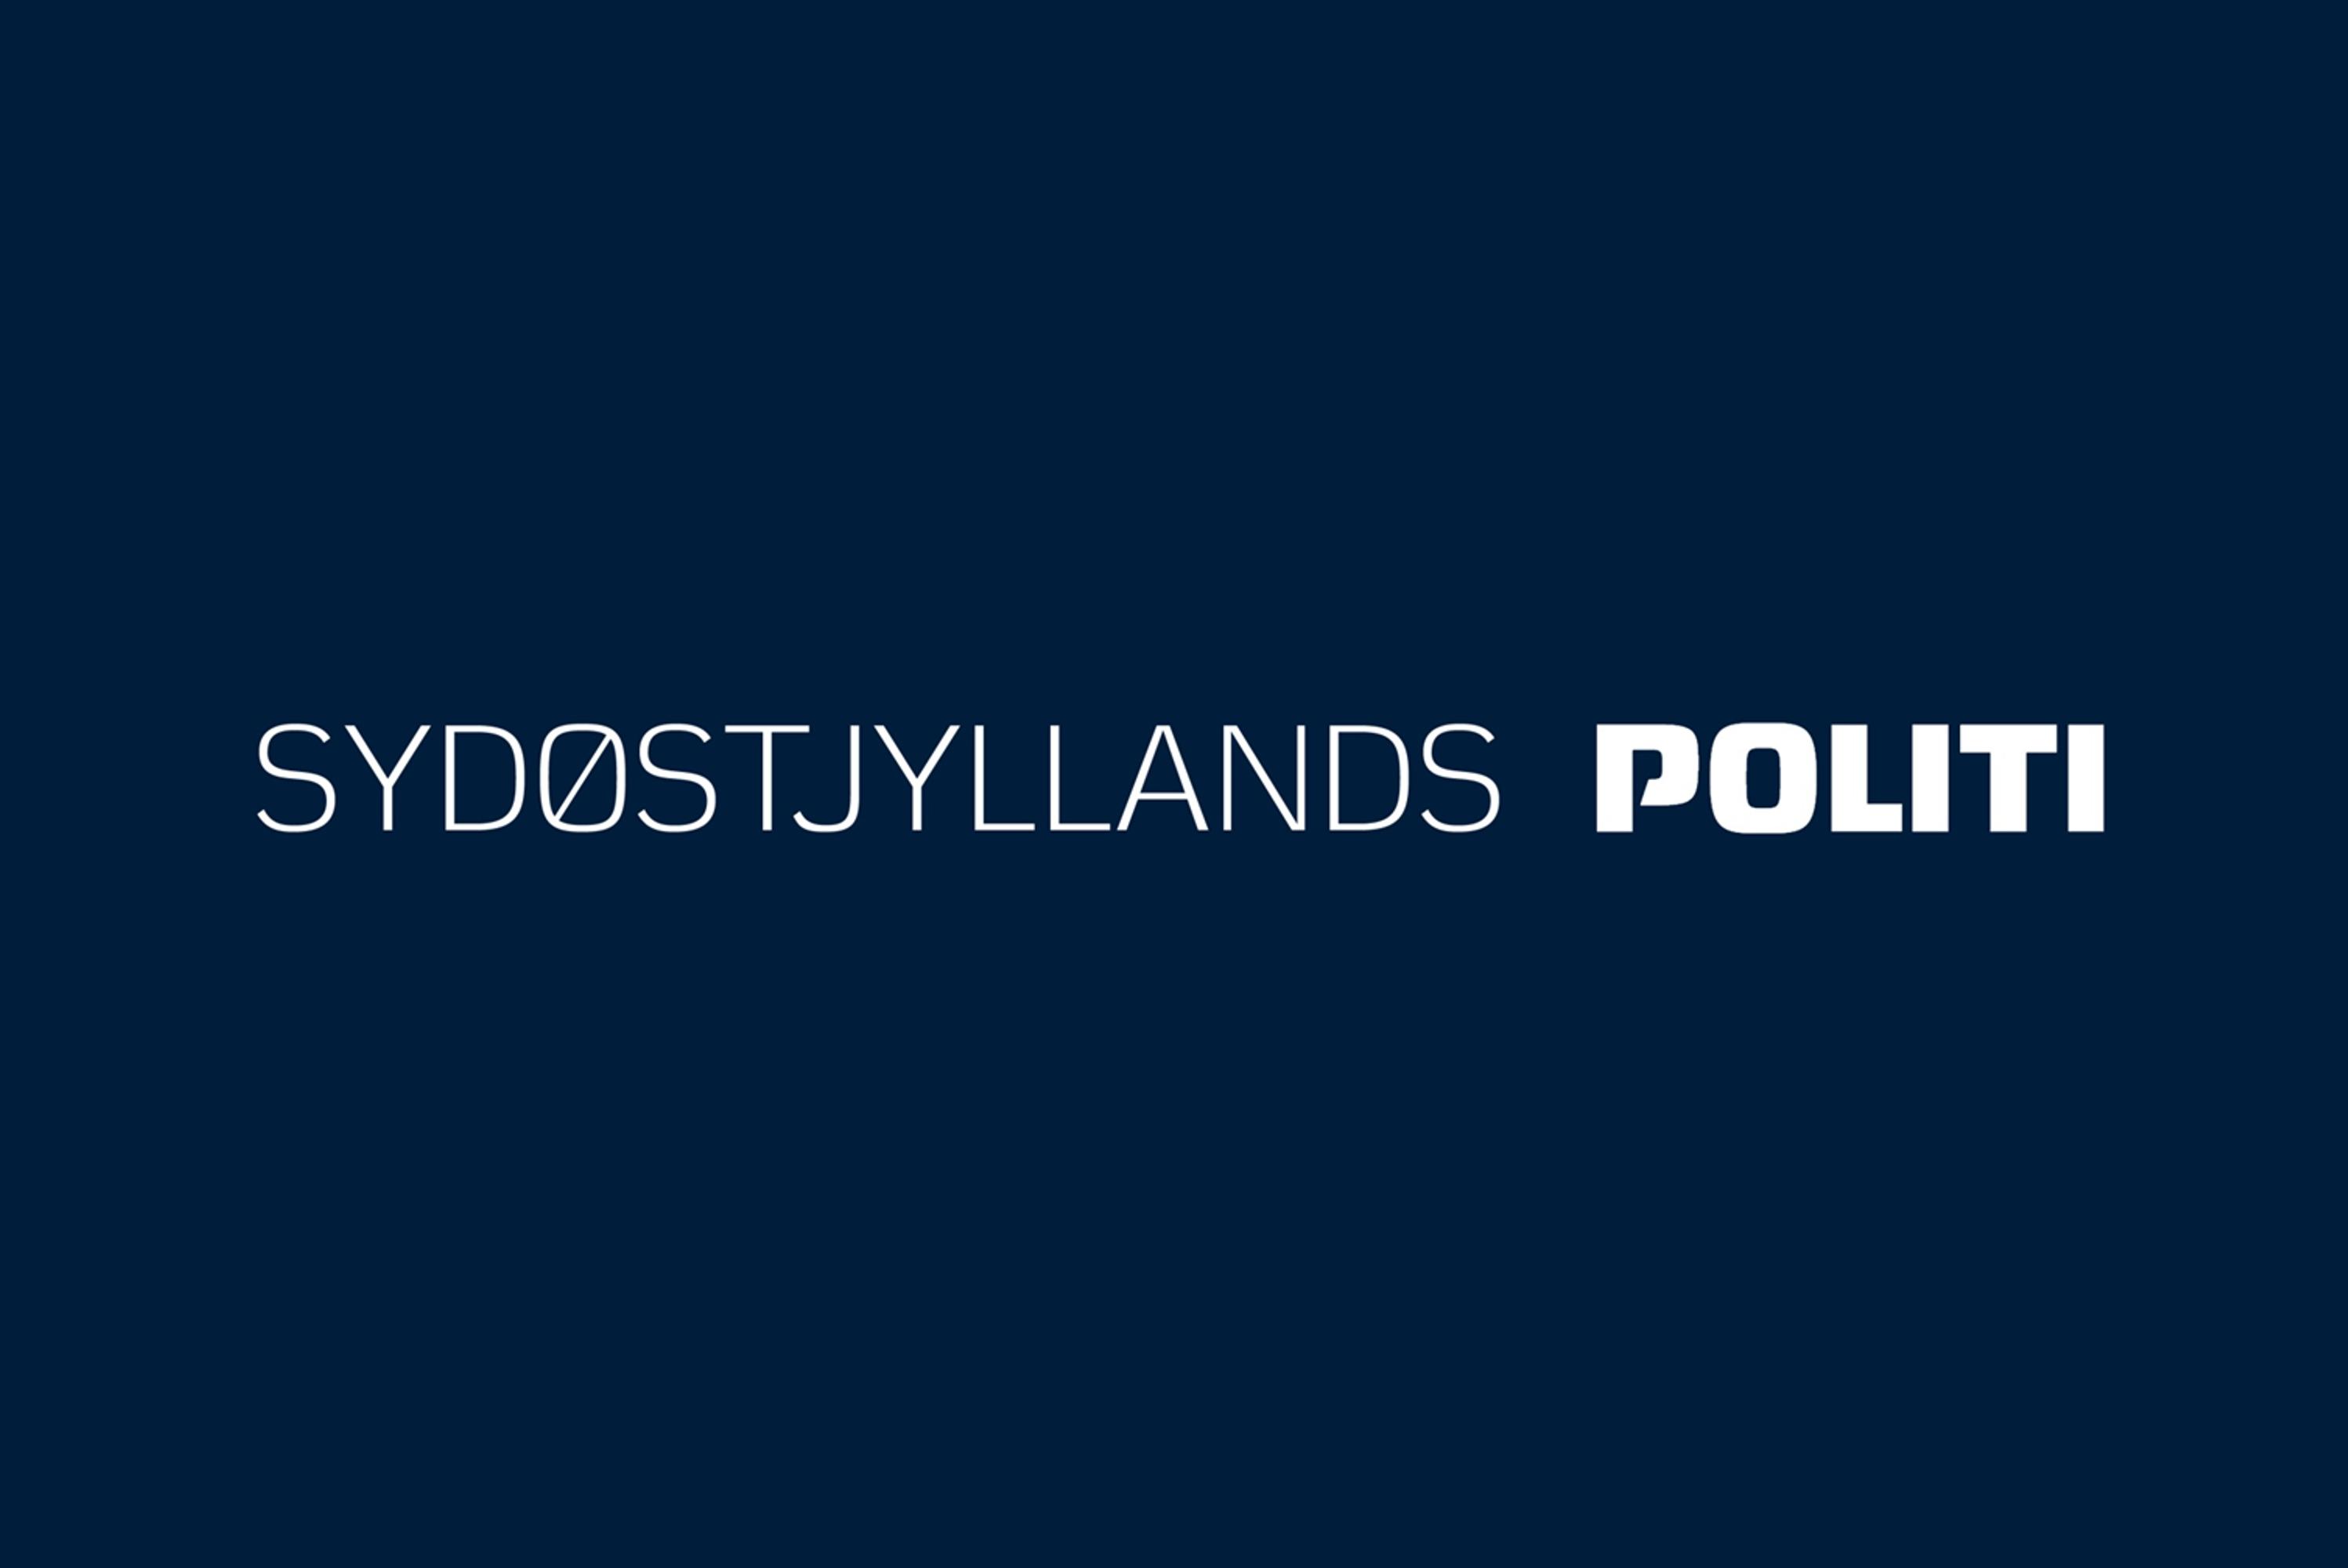 Sydøstjylland Politis logo